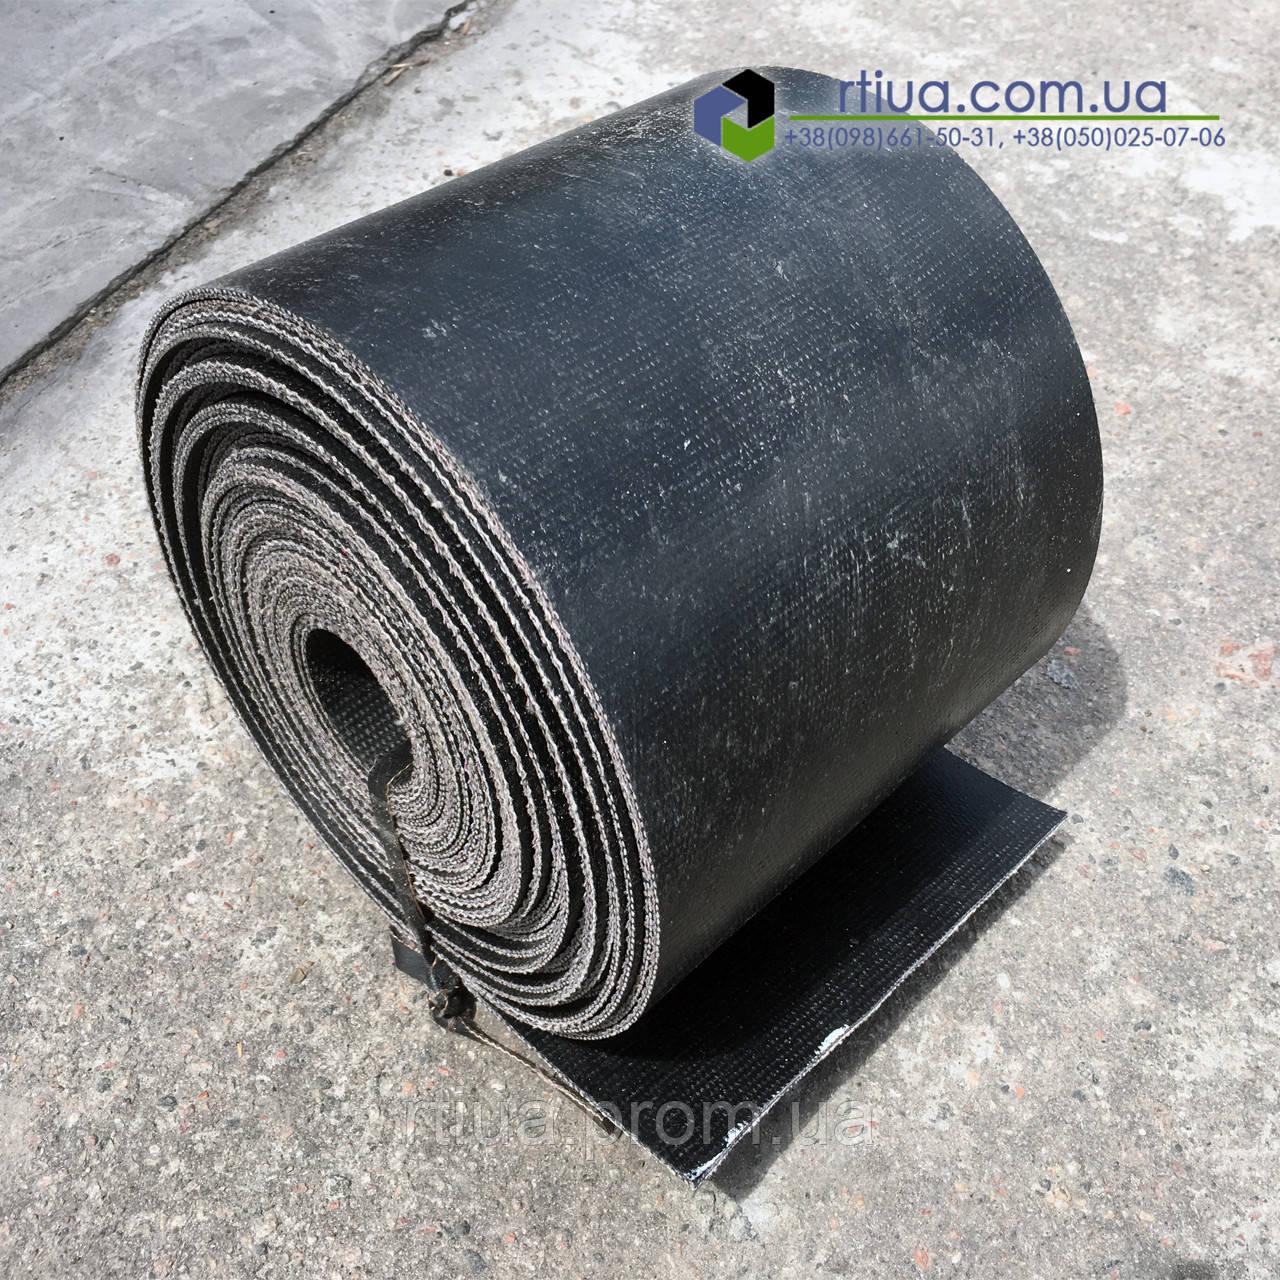 Транспортерная лента ТК-200, 1200х4 - 5/2 (11 мм)